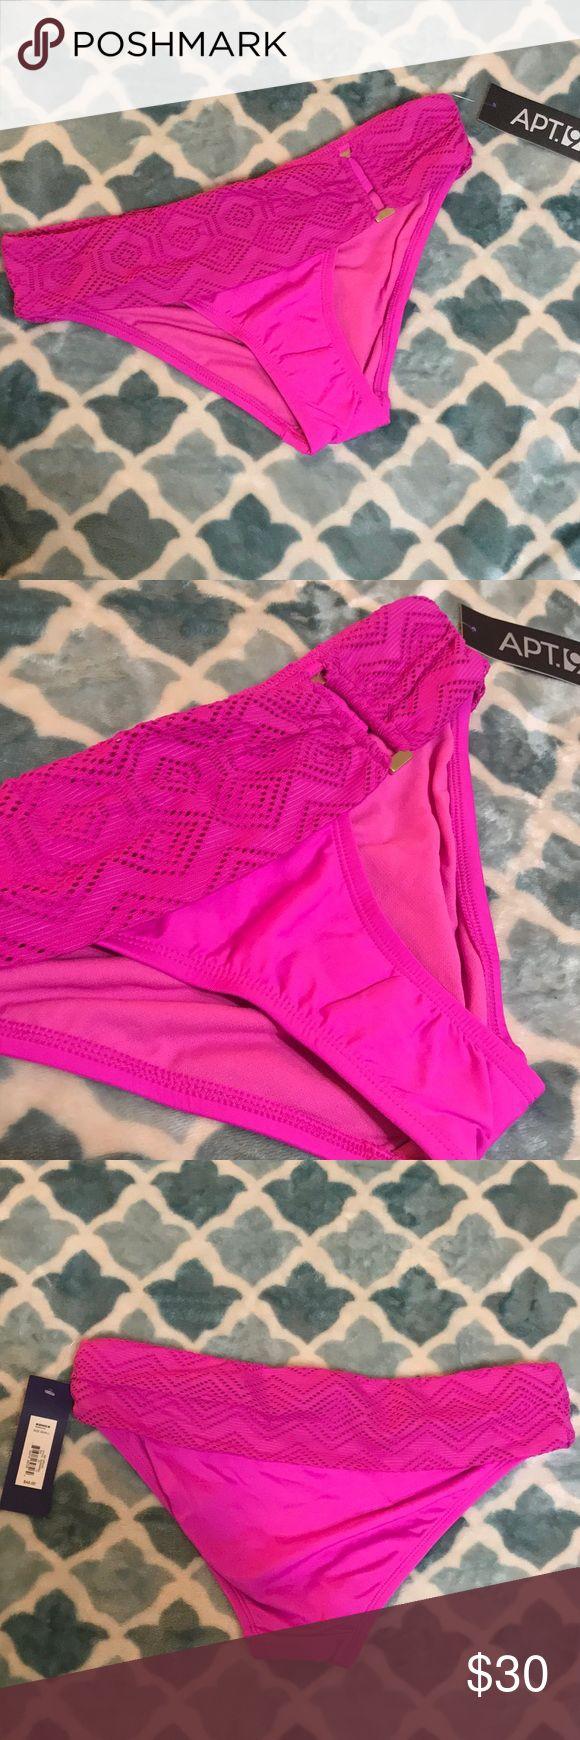 "NWT Apt 9 Orchid bright purple bikini bottom small NWT Apt 9 Orchid bright purple bikini bottom, size small. Self: 84% nylon 16% spandex Lining: 100% Polyester Contrast: 90% Nylon 10% Spandex. All measurements are approximate, 30"" waist Apt. 9 Swim Bikinis"